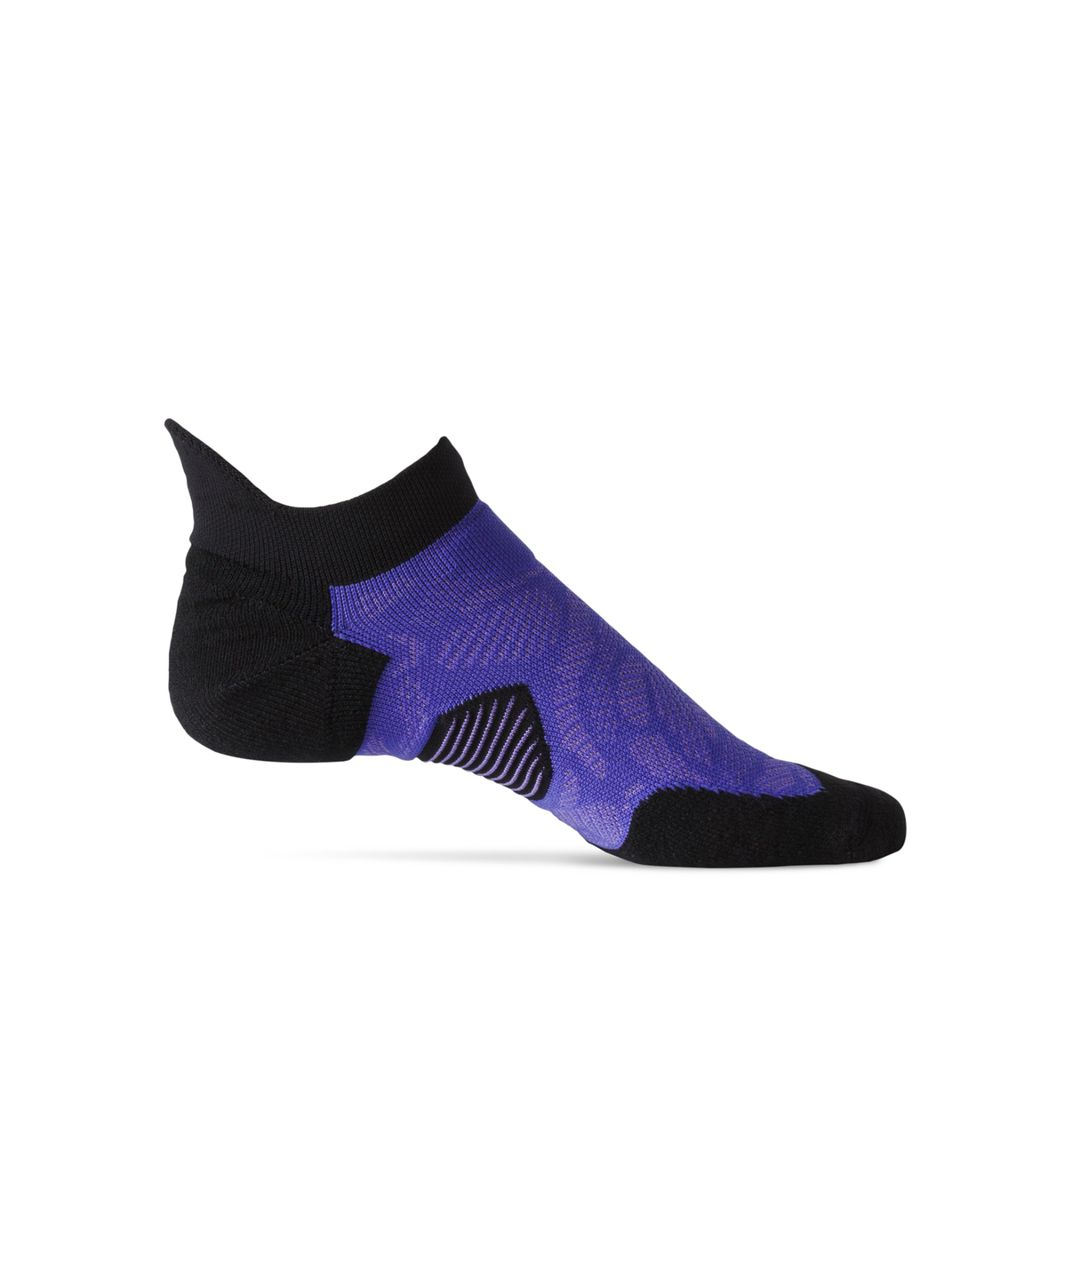 Lululemon High Speed Sock (Silver) - Super Purple / Power Purple / Black